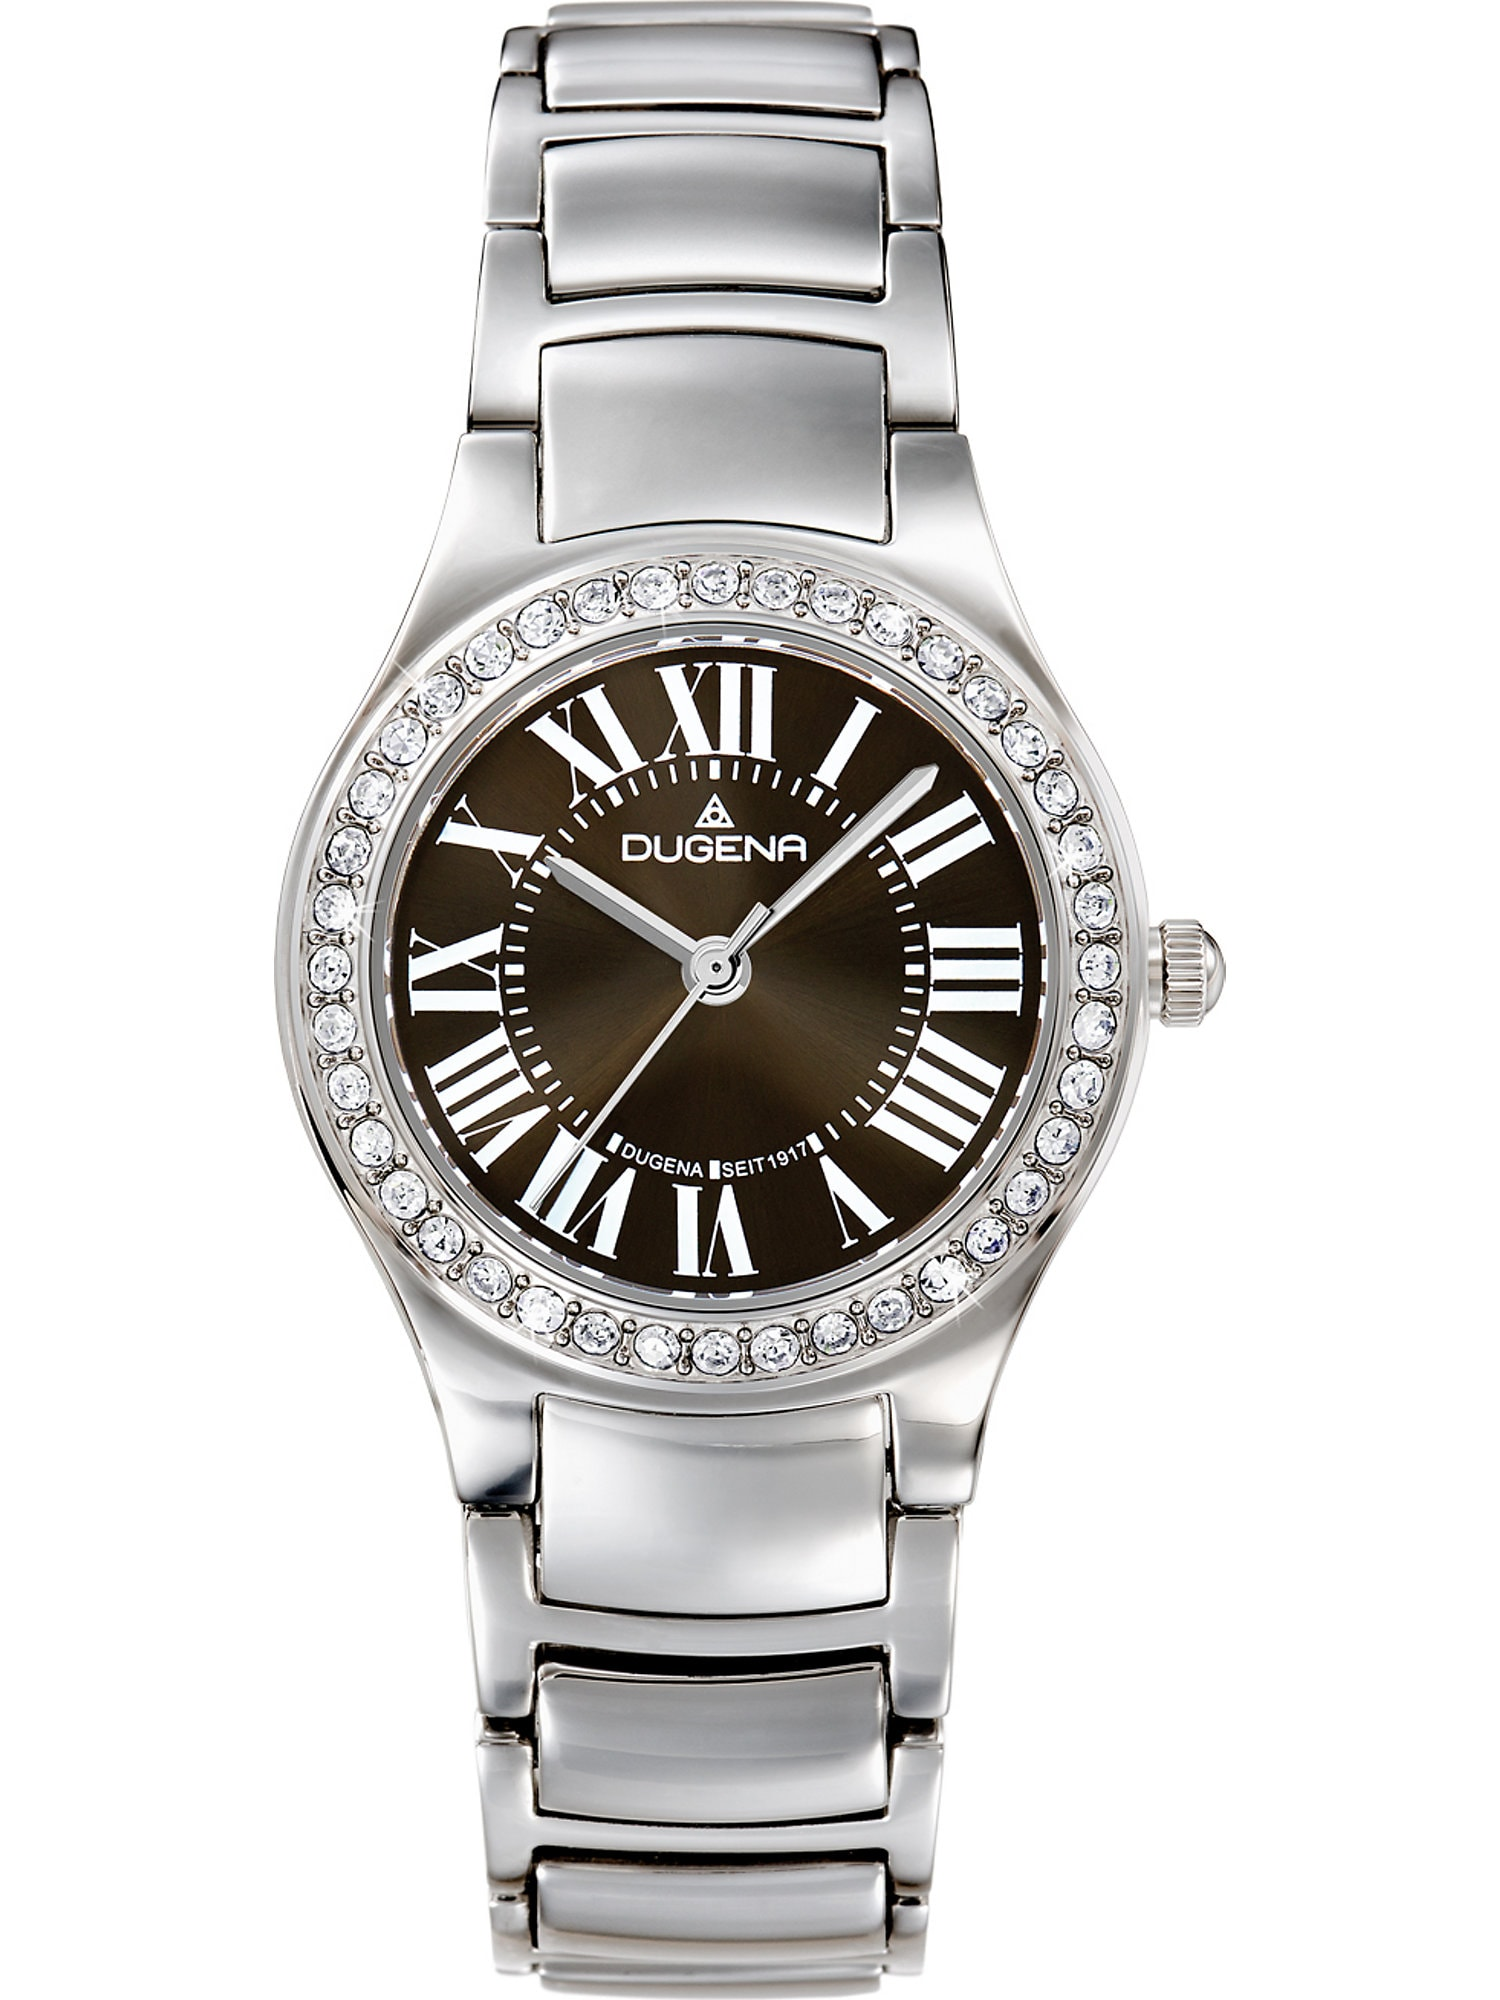 Damen DUGENA Uhr grau,  rot,  weiß, silber | 04250645007407